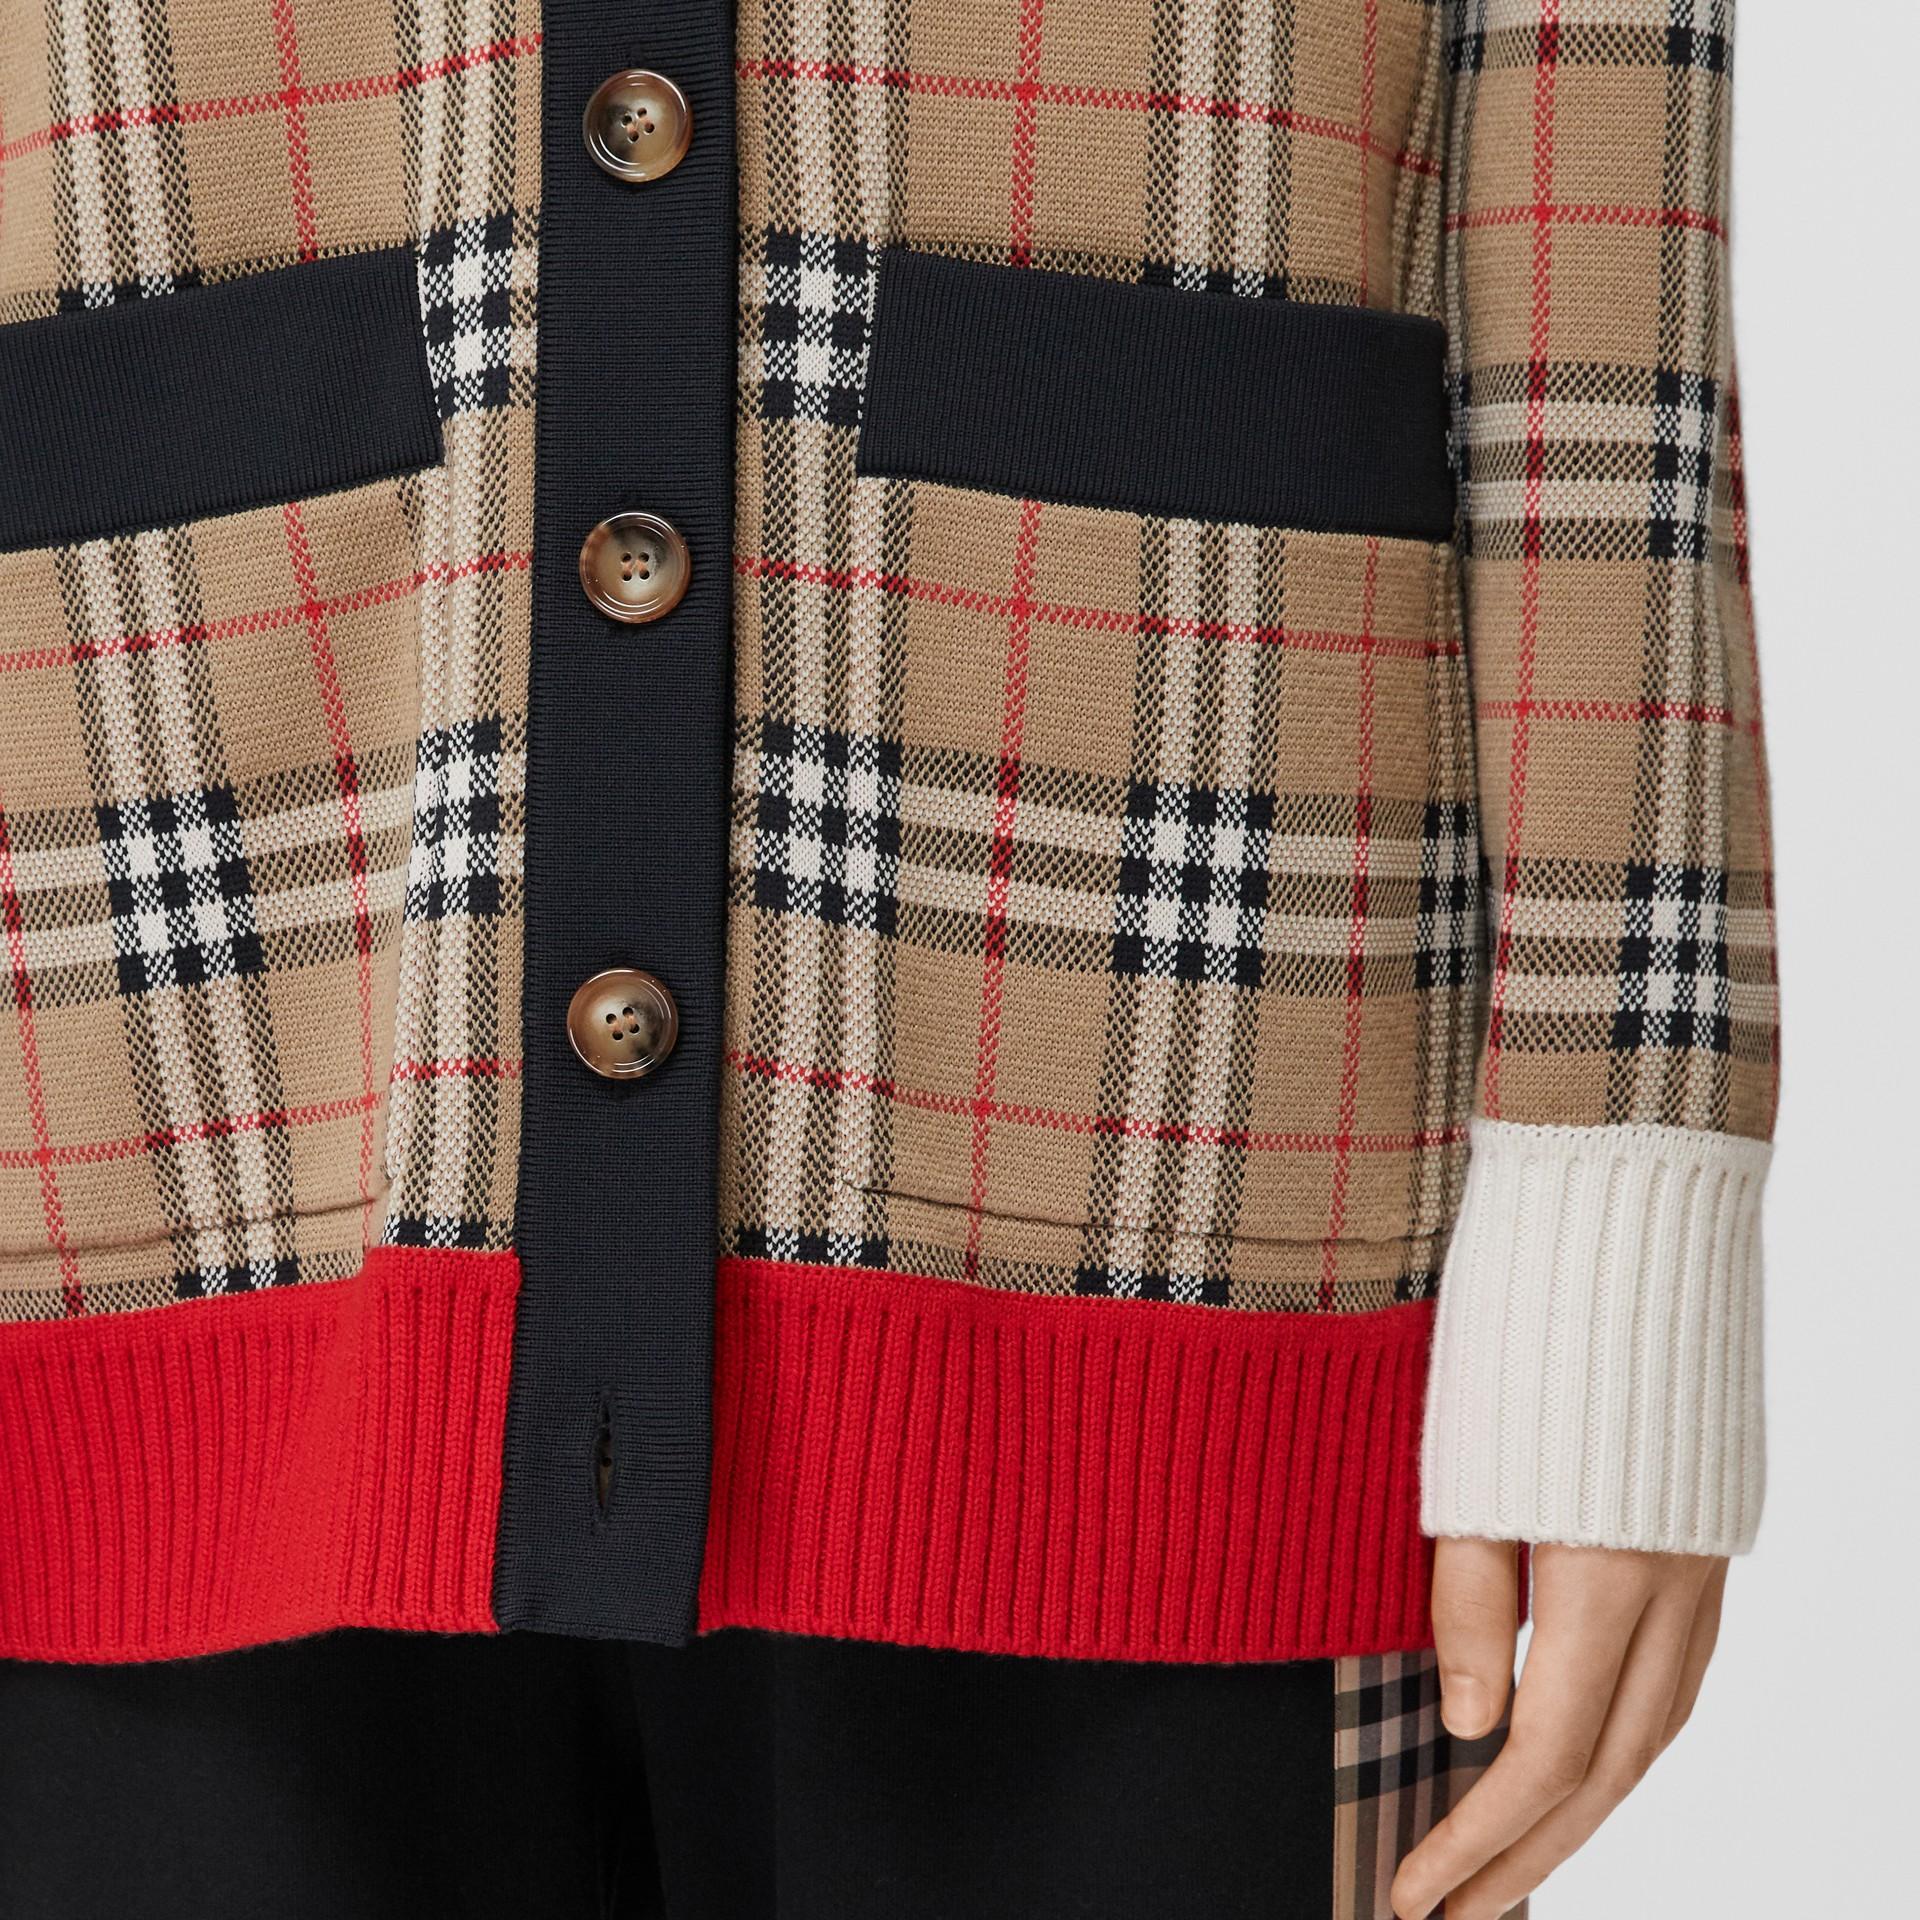 Vintage Check Merino Wool Blend Jacquard Cardigan in Archive Beige - Women   Burberry - gallery image 4